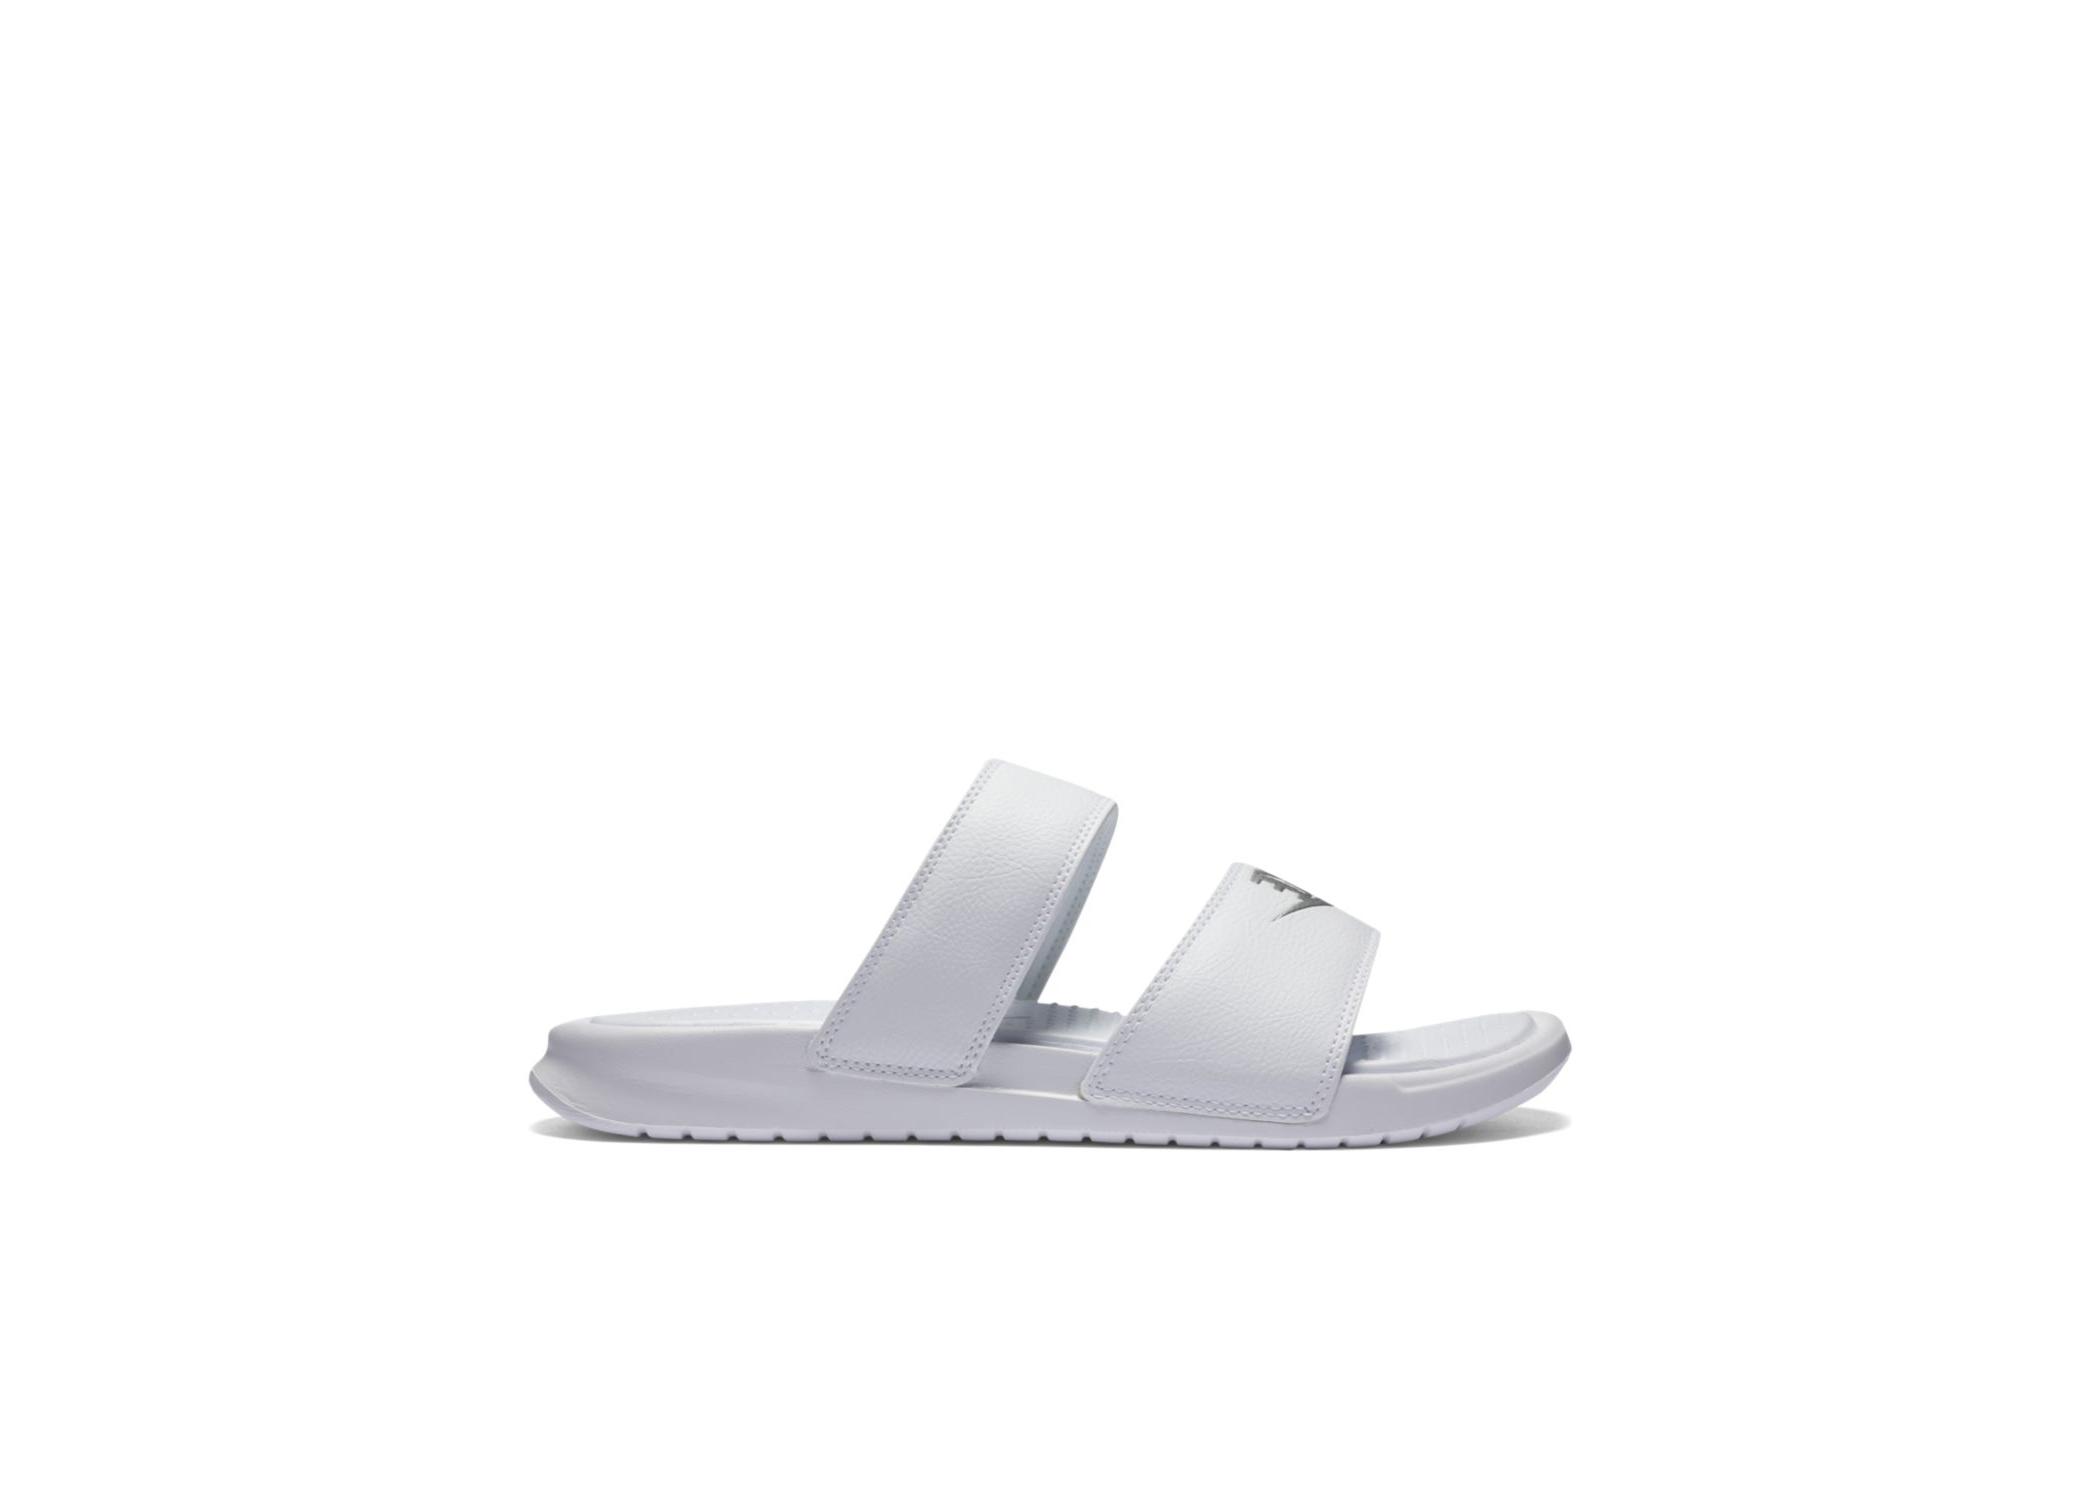 Nike Benassi Duo Ultra White Metallic